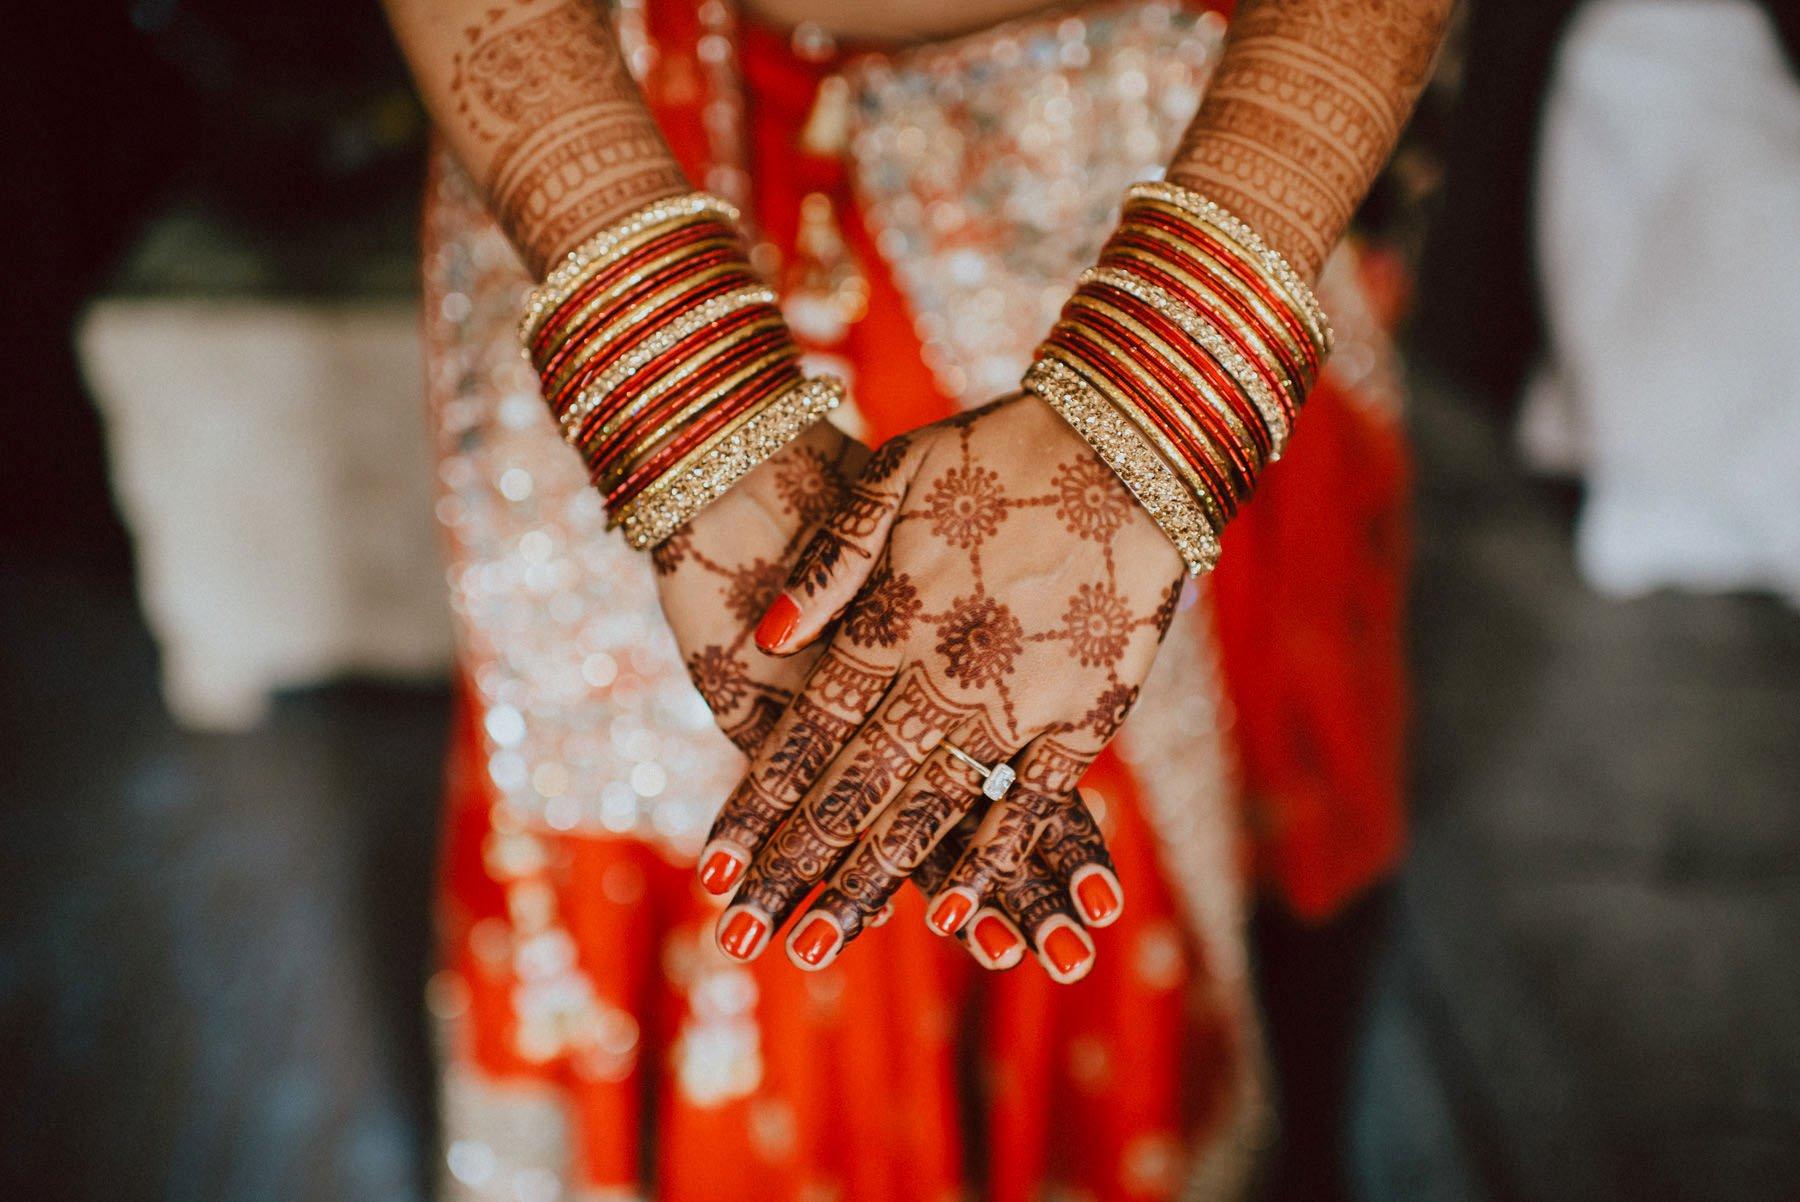 vie-philadelphia-indian-wedding-26.jpg